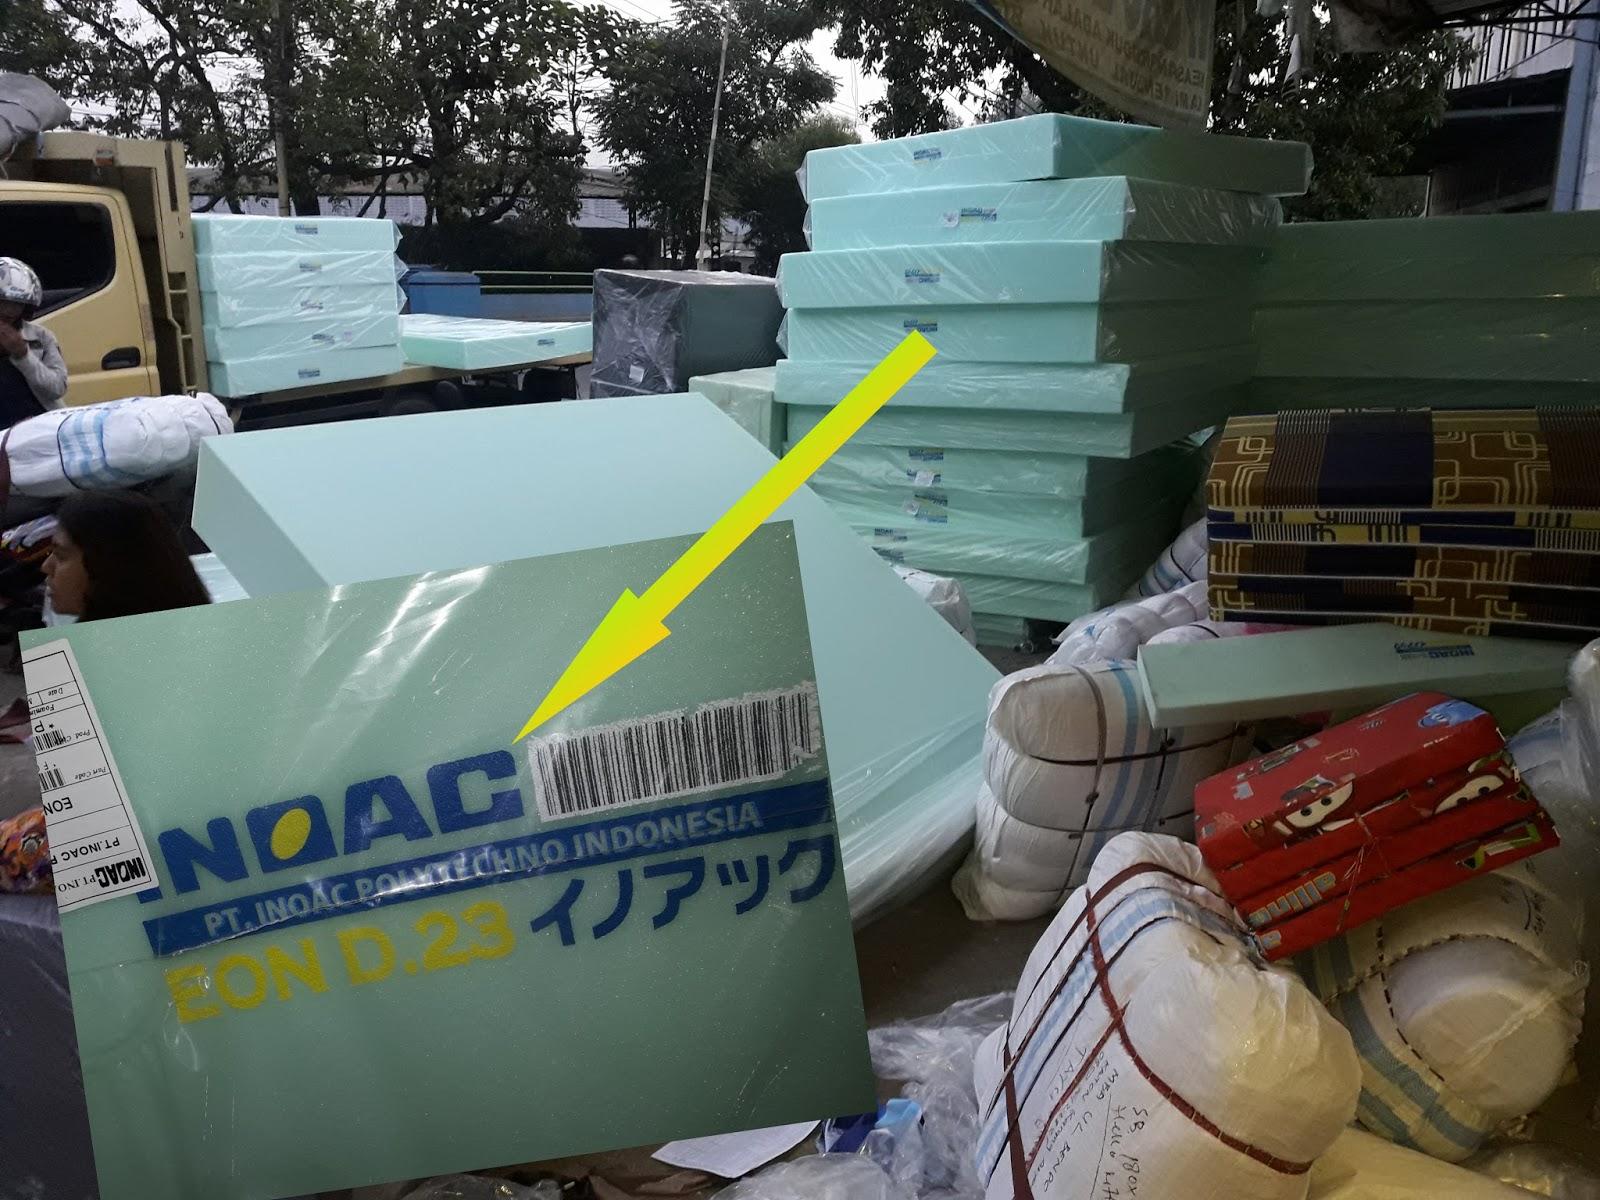 Harga Sofa Bed Inoac 2017 Country Cottage Throws Kasur 2018 Distributor Dan Agen Resmi